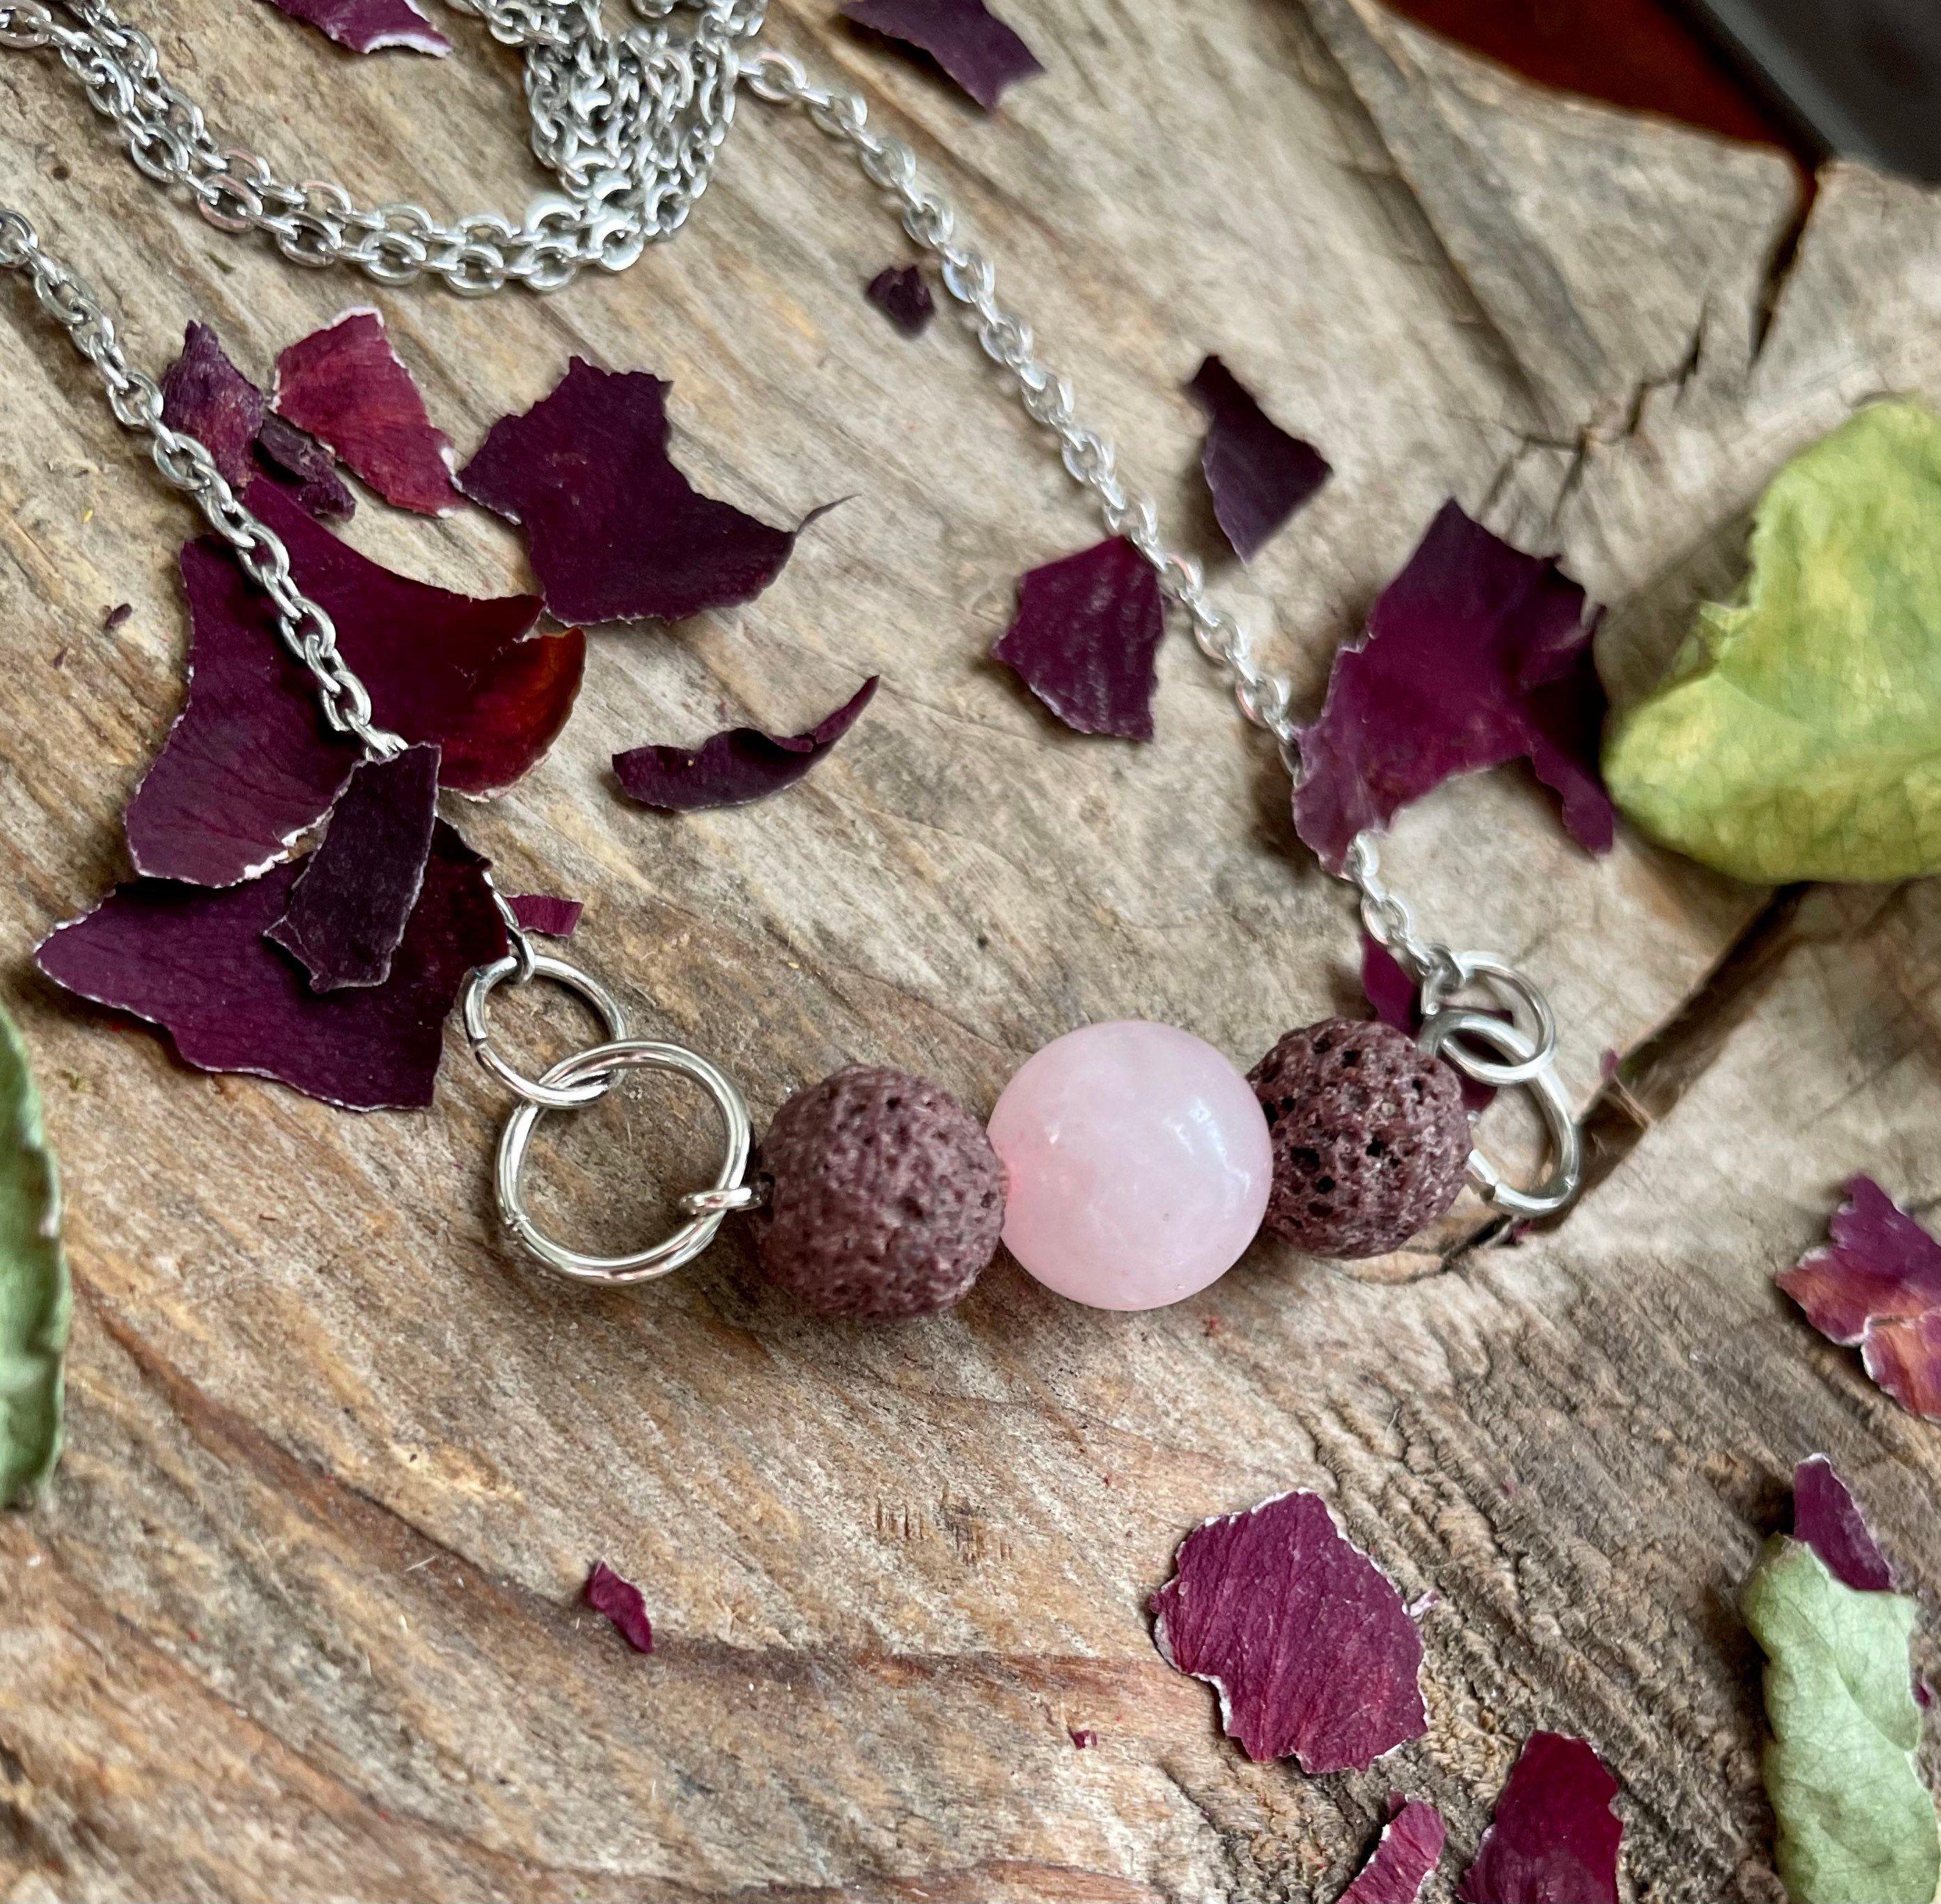 Essential Oil Necklace for Women Rose Quartz Lava Stone Necklace Rose Quartz Healing Stone Necklace Rose Quartz Aromatherapy Necklace